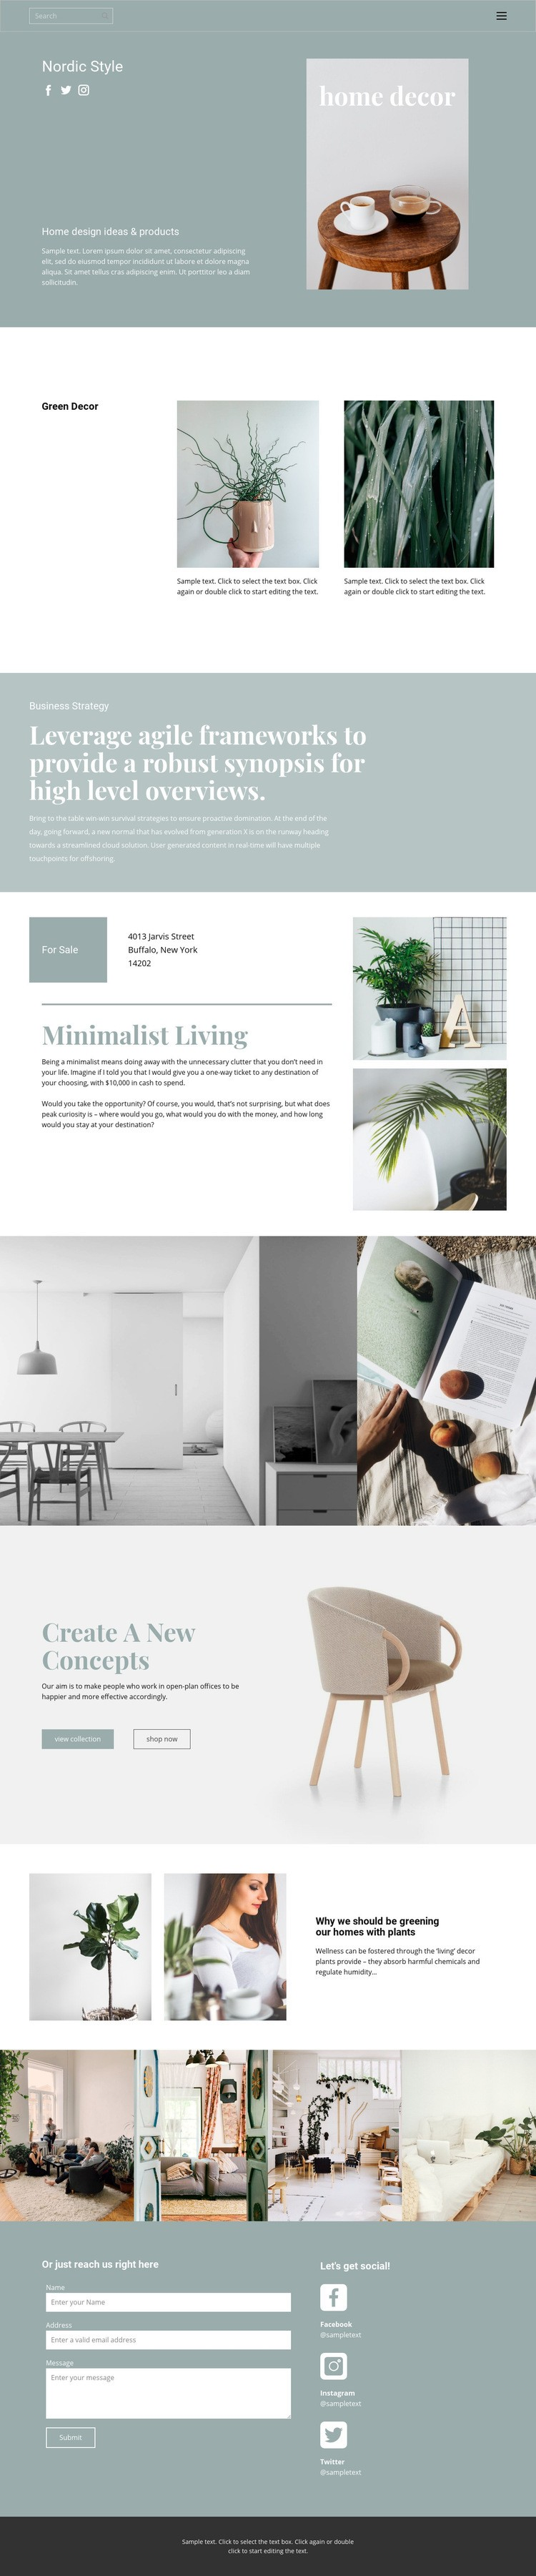 Help interior designer Web Page Design